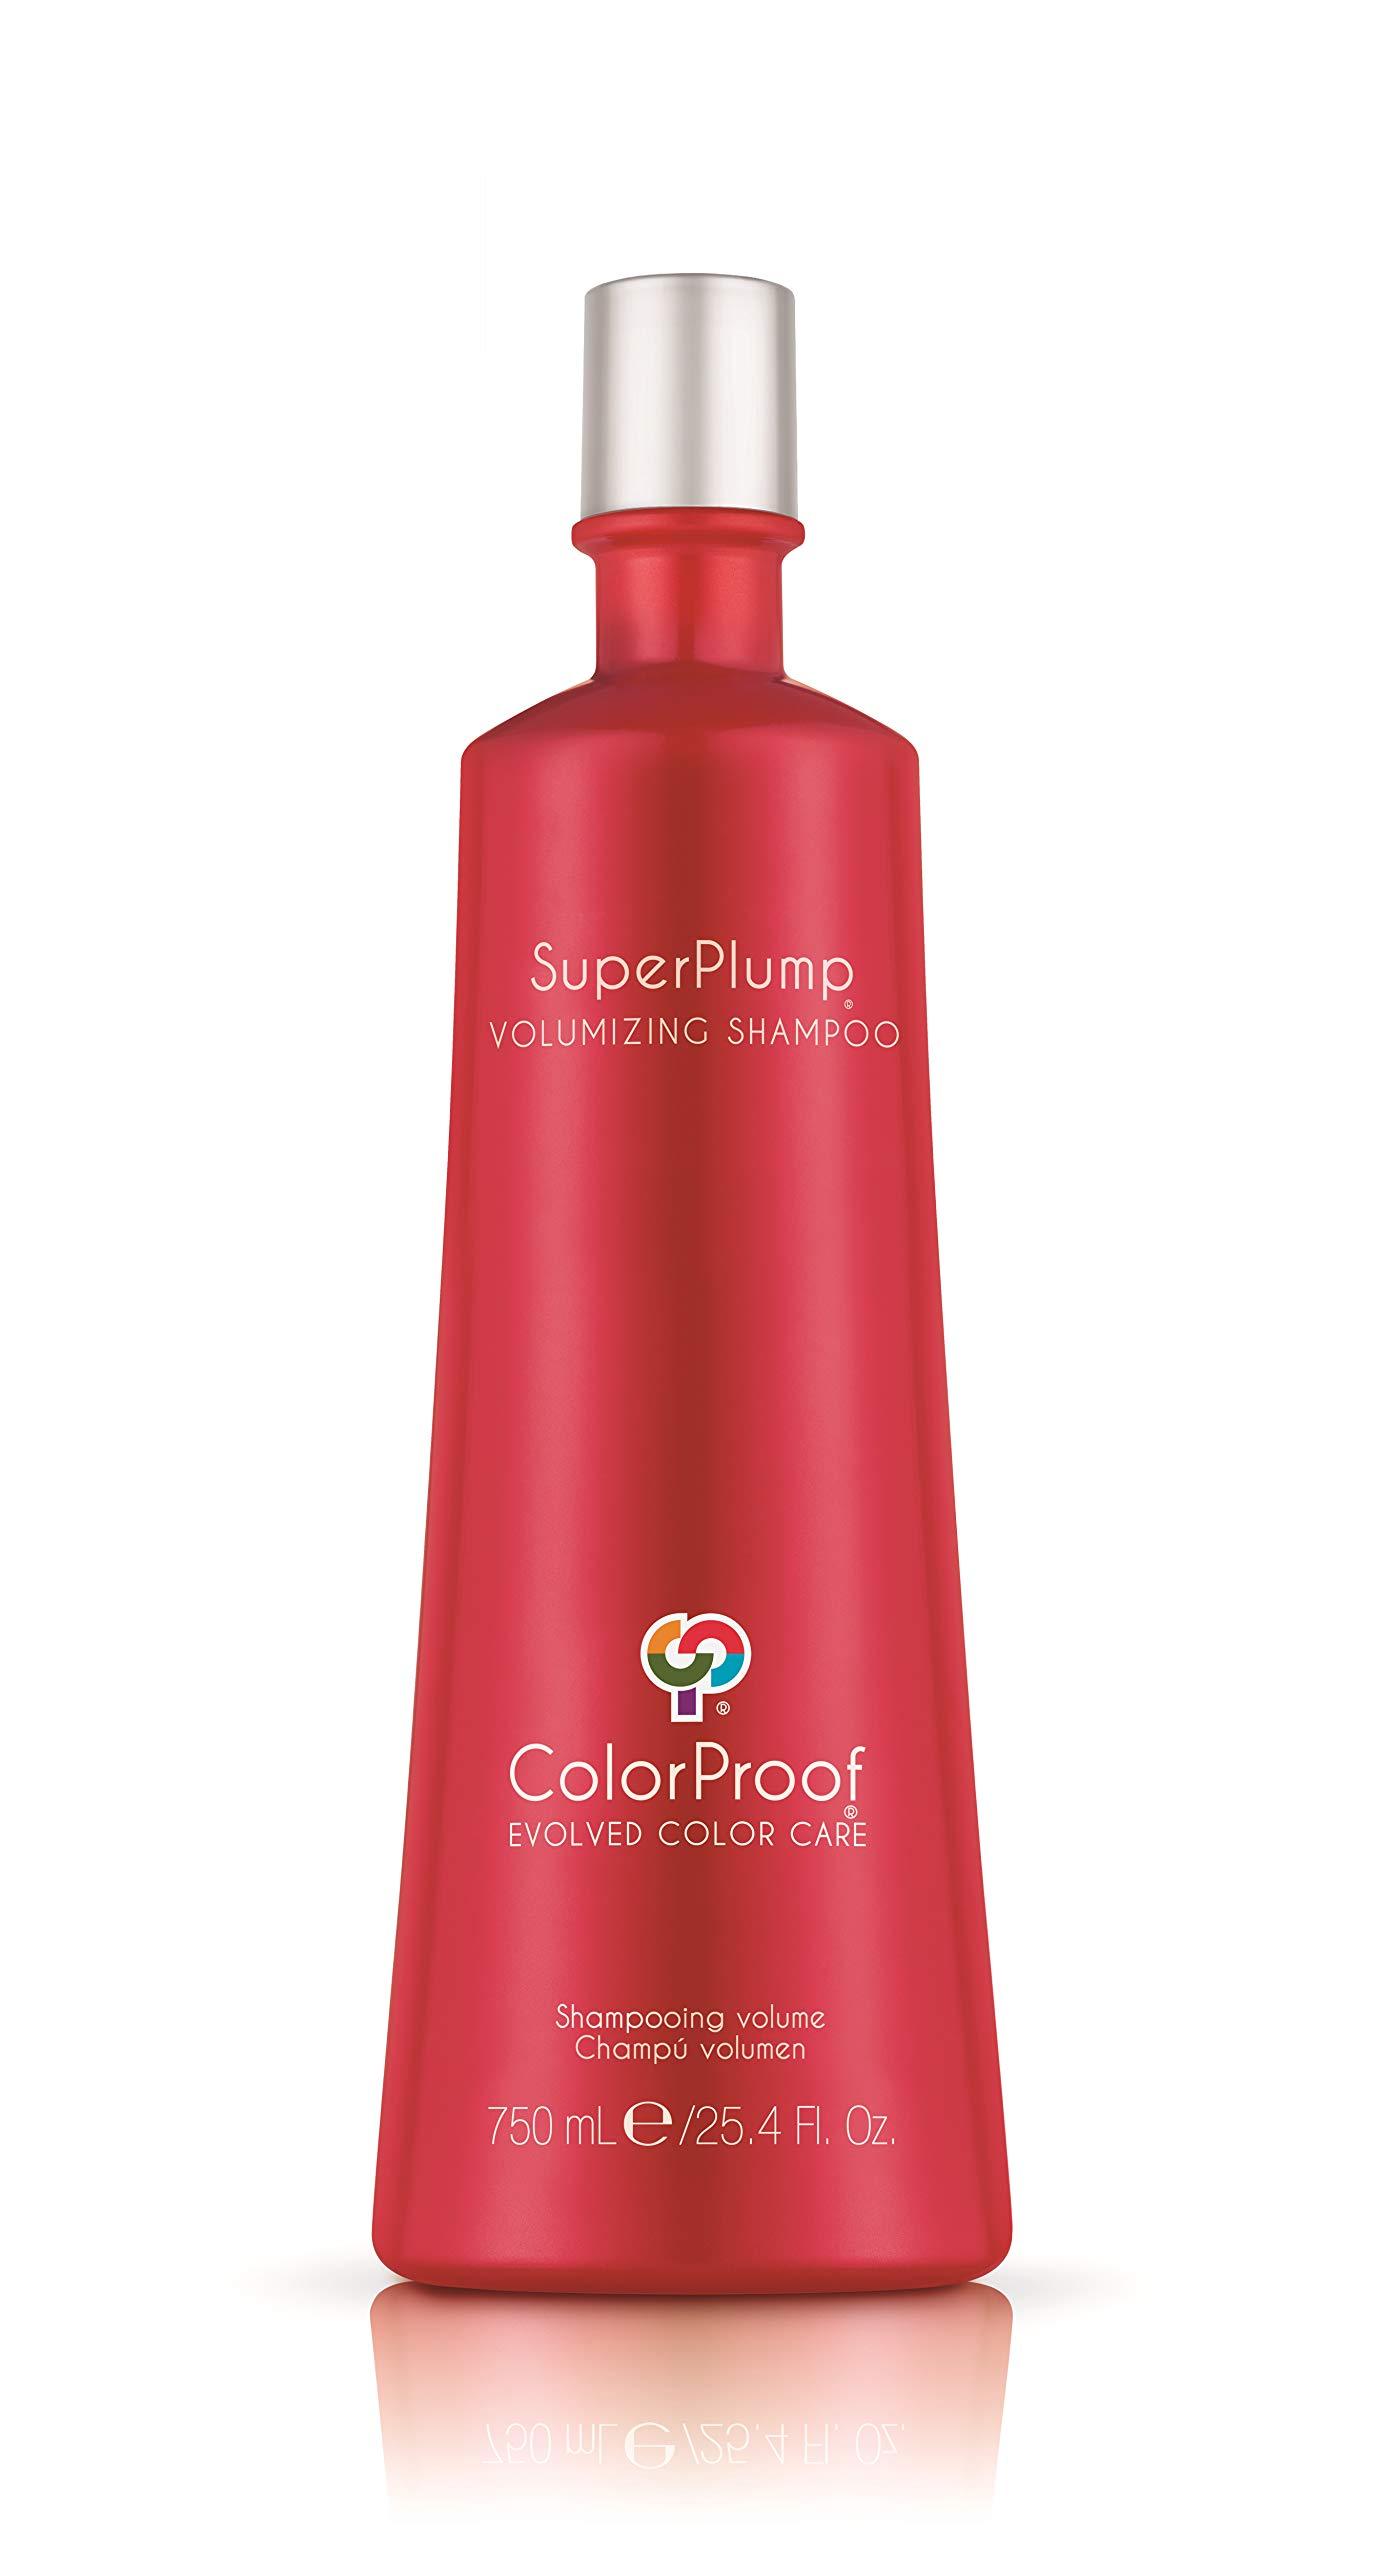 ColorProof Color Care Authority SuperPlump Volumizing Shampoo, 25.4 fl. Oz.